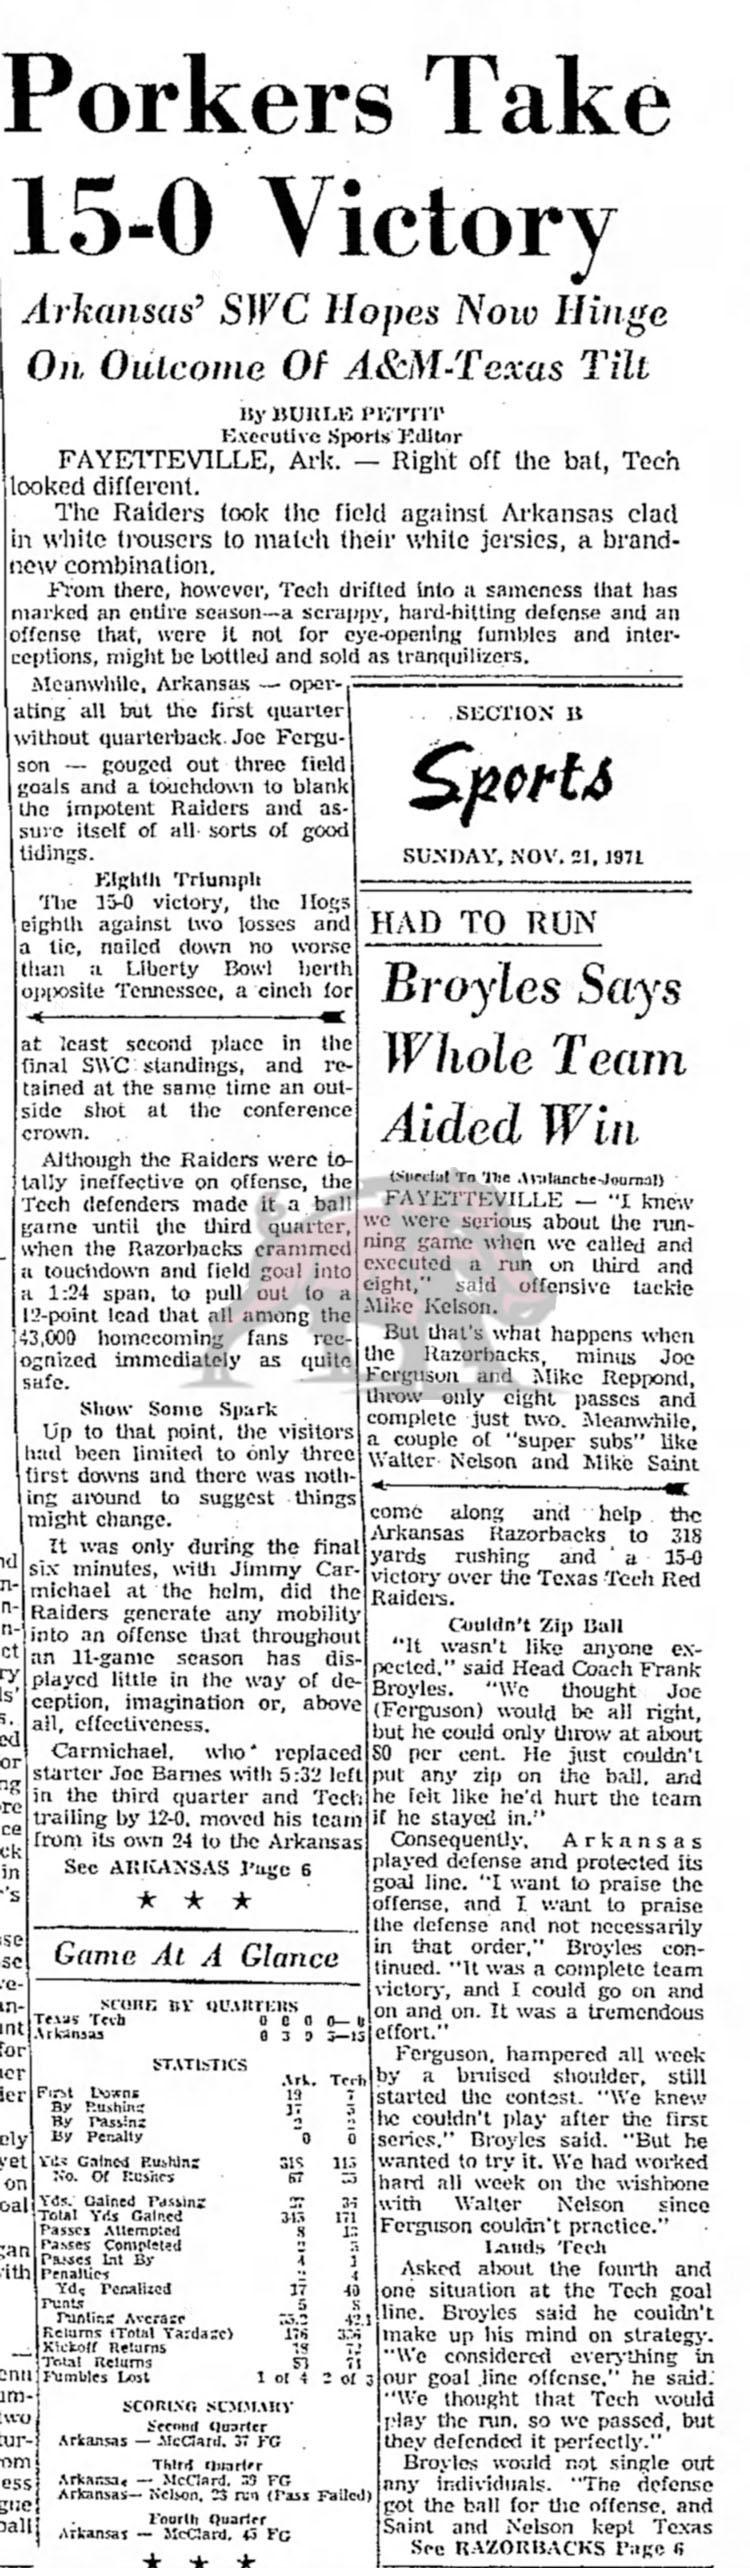 1971-11-21 Lubbock_Avalanche_Journal_Sun__Nov_21__1971_